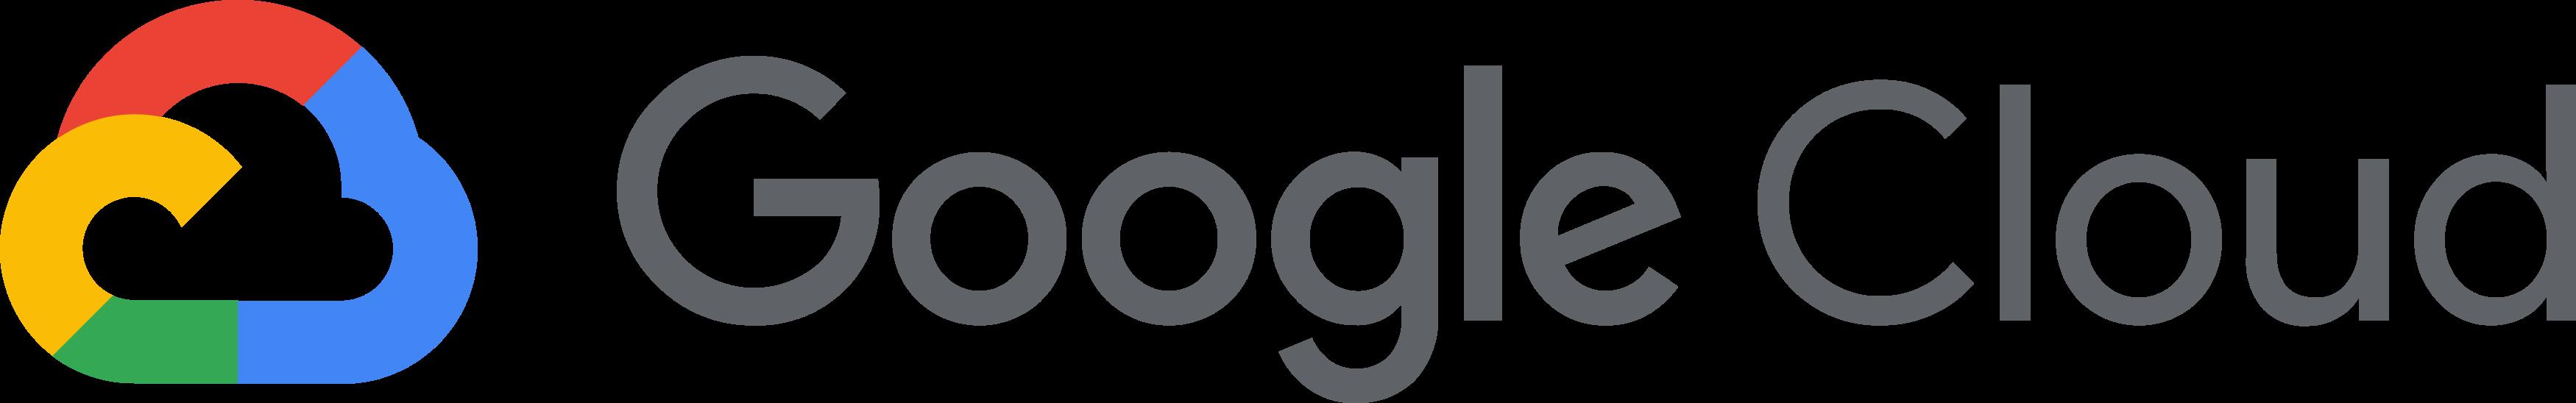 google-cloud-logo